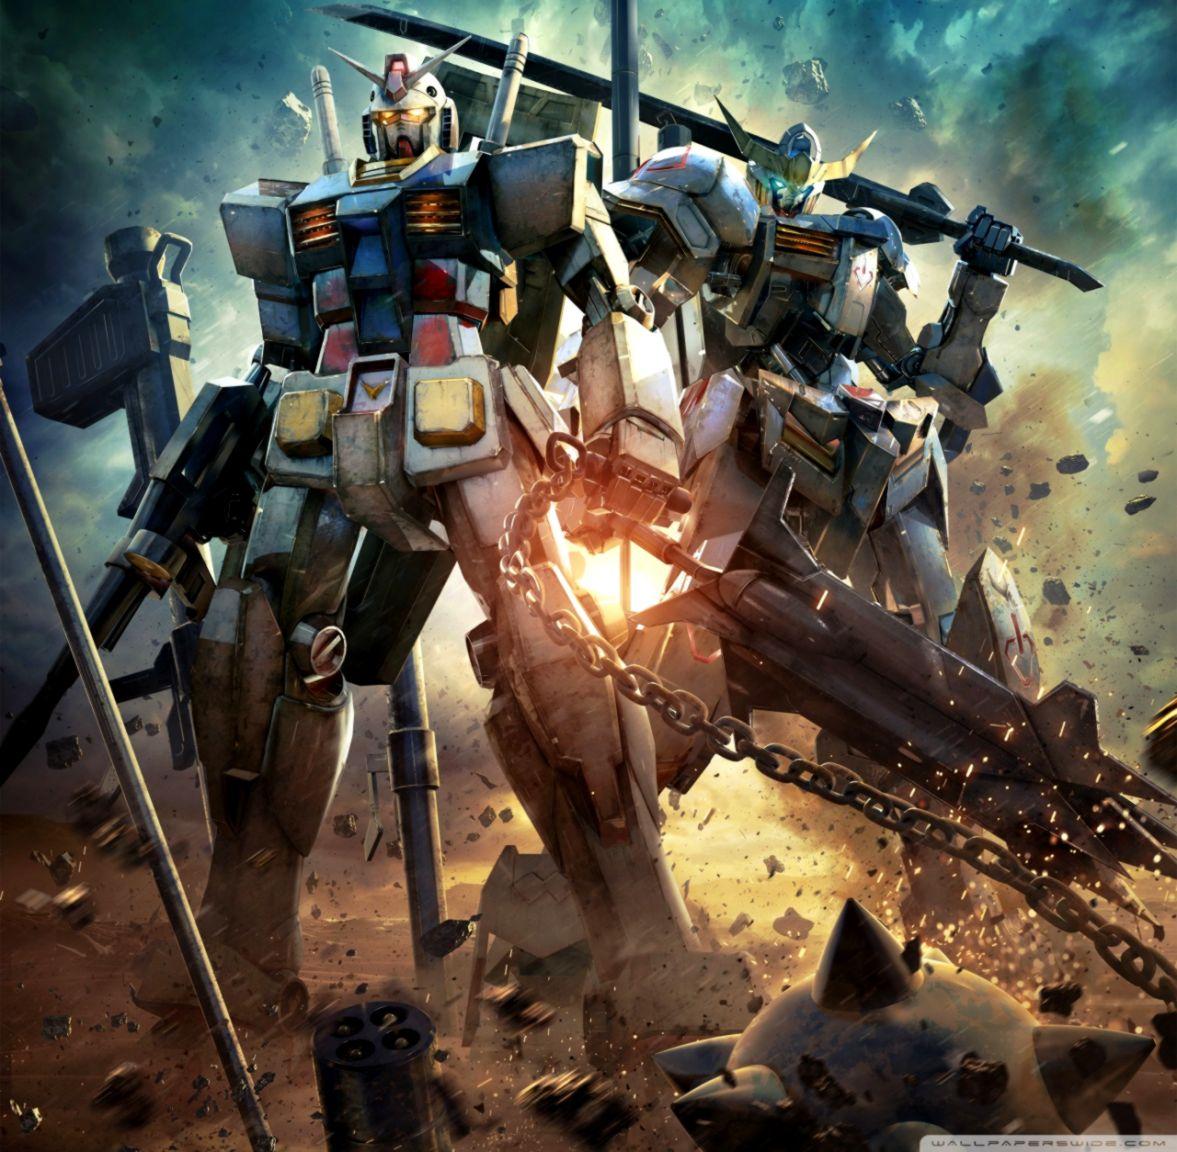 Gundam Android Wallpaper Wallpapers Snipe